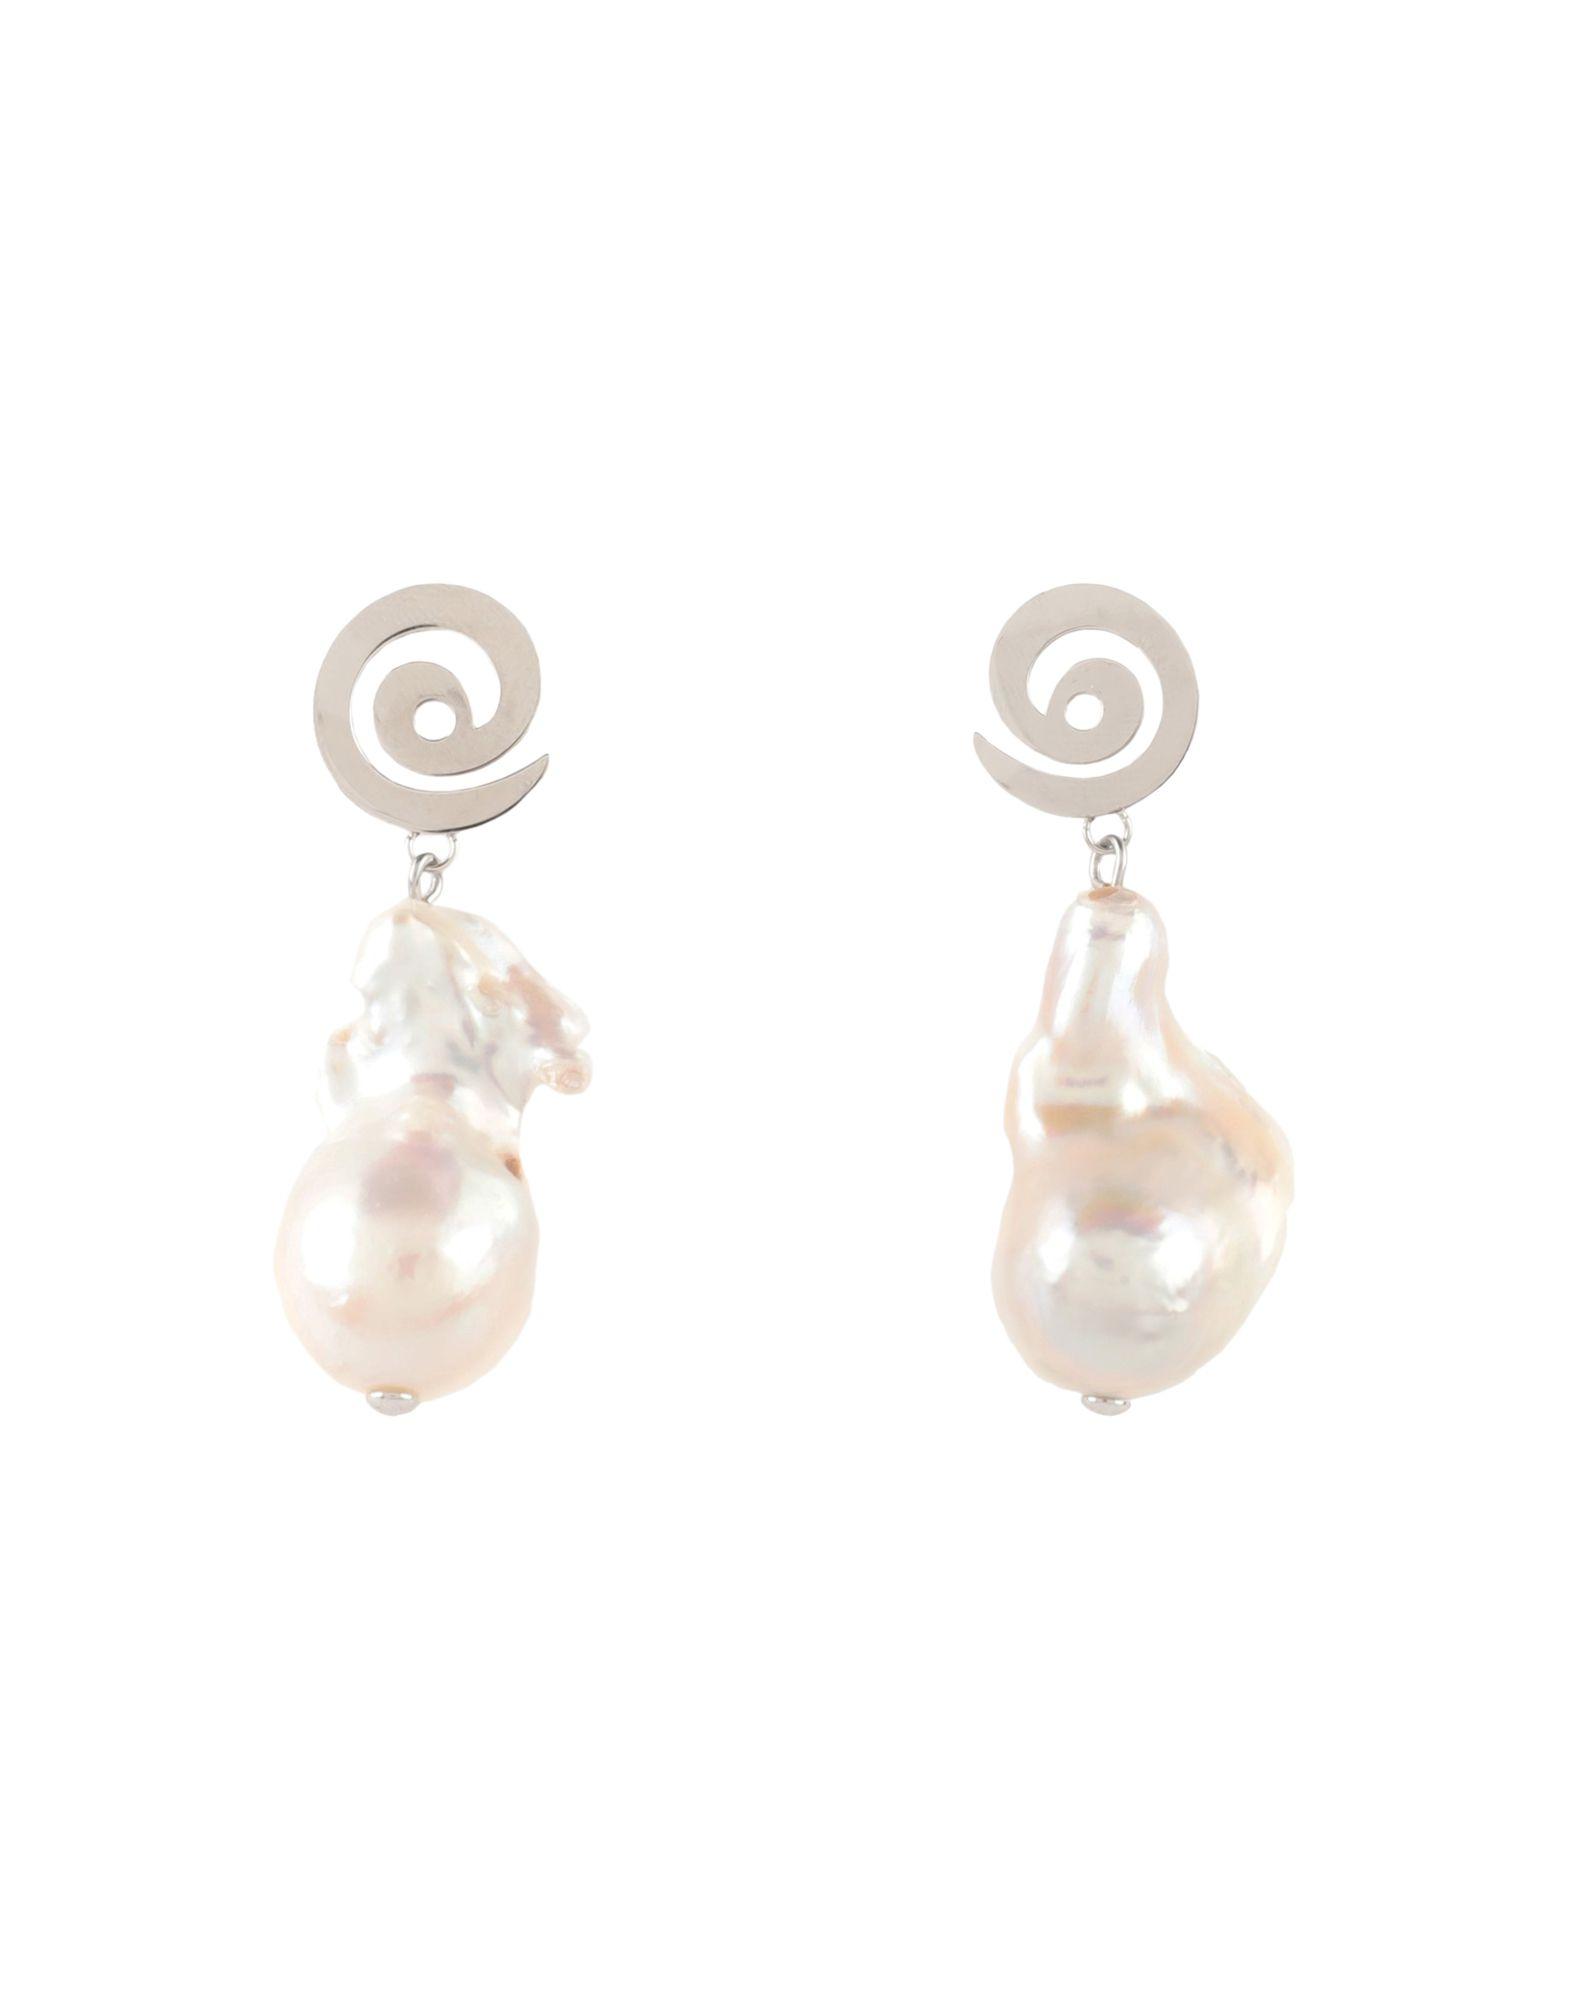 TORY BURCH Earrings - Item 50245324